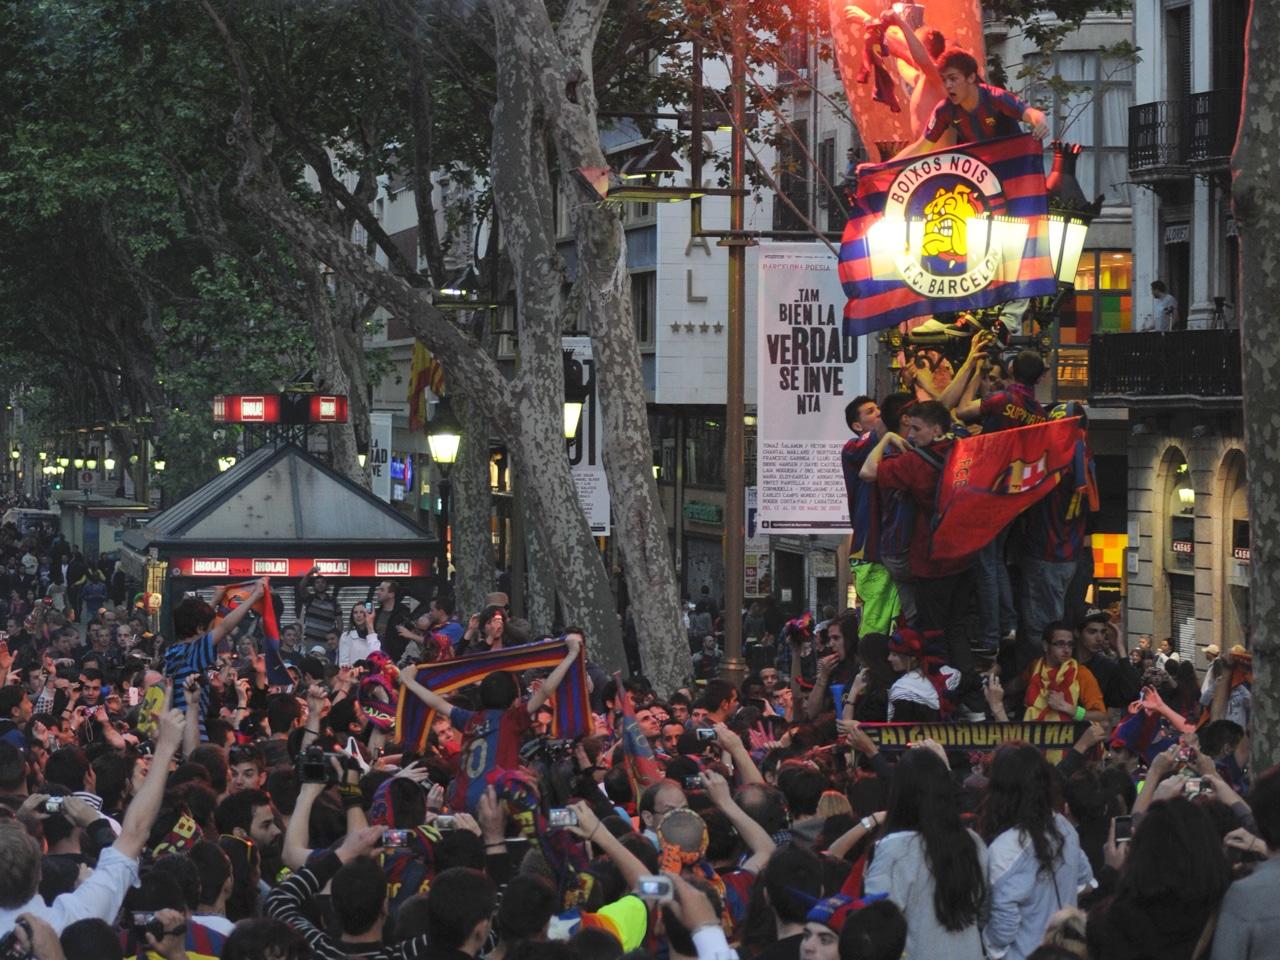 LEGO 40485 Fc Barcelona Celebration Font De Canaletes